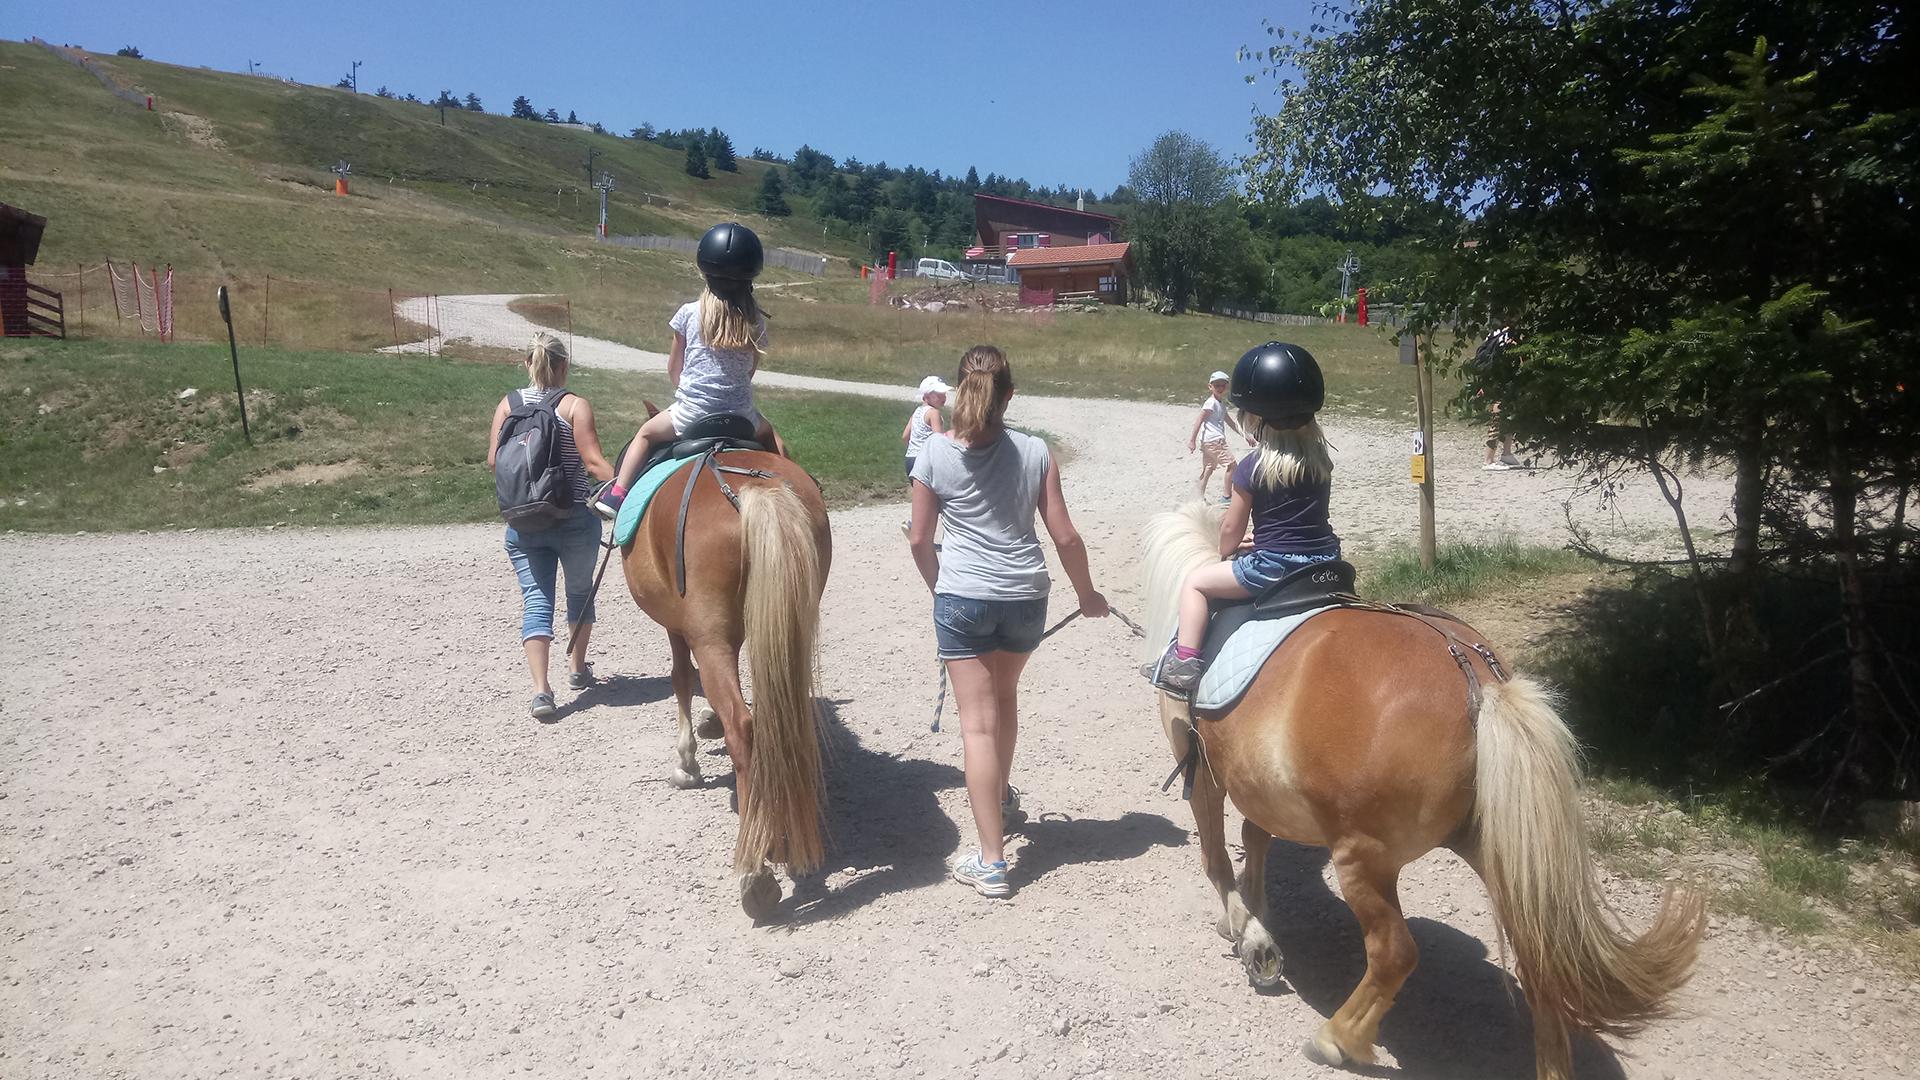 praboure-parc-activite-montagne-balade-en-poneys-slider-2